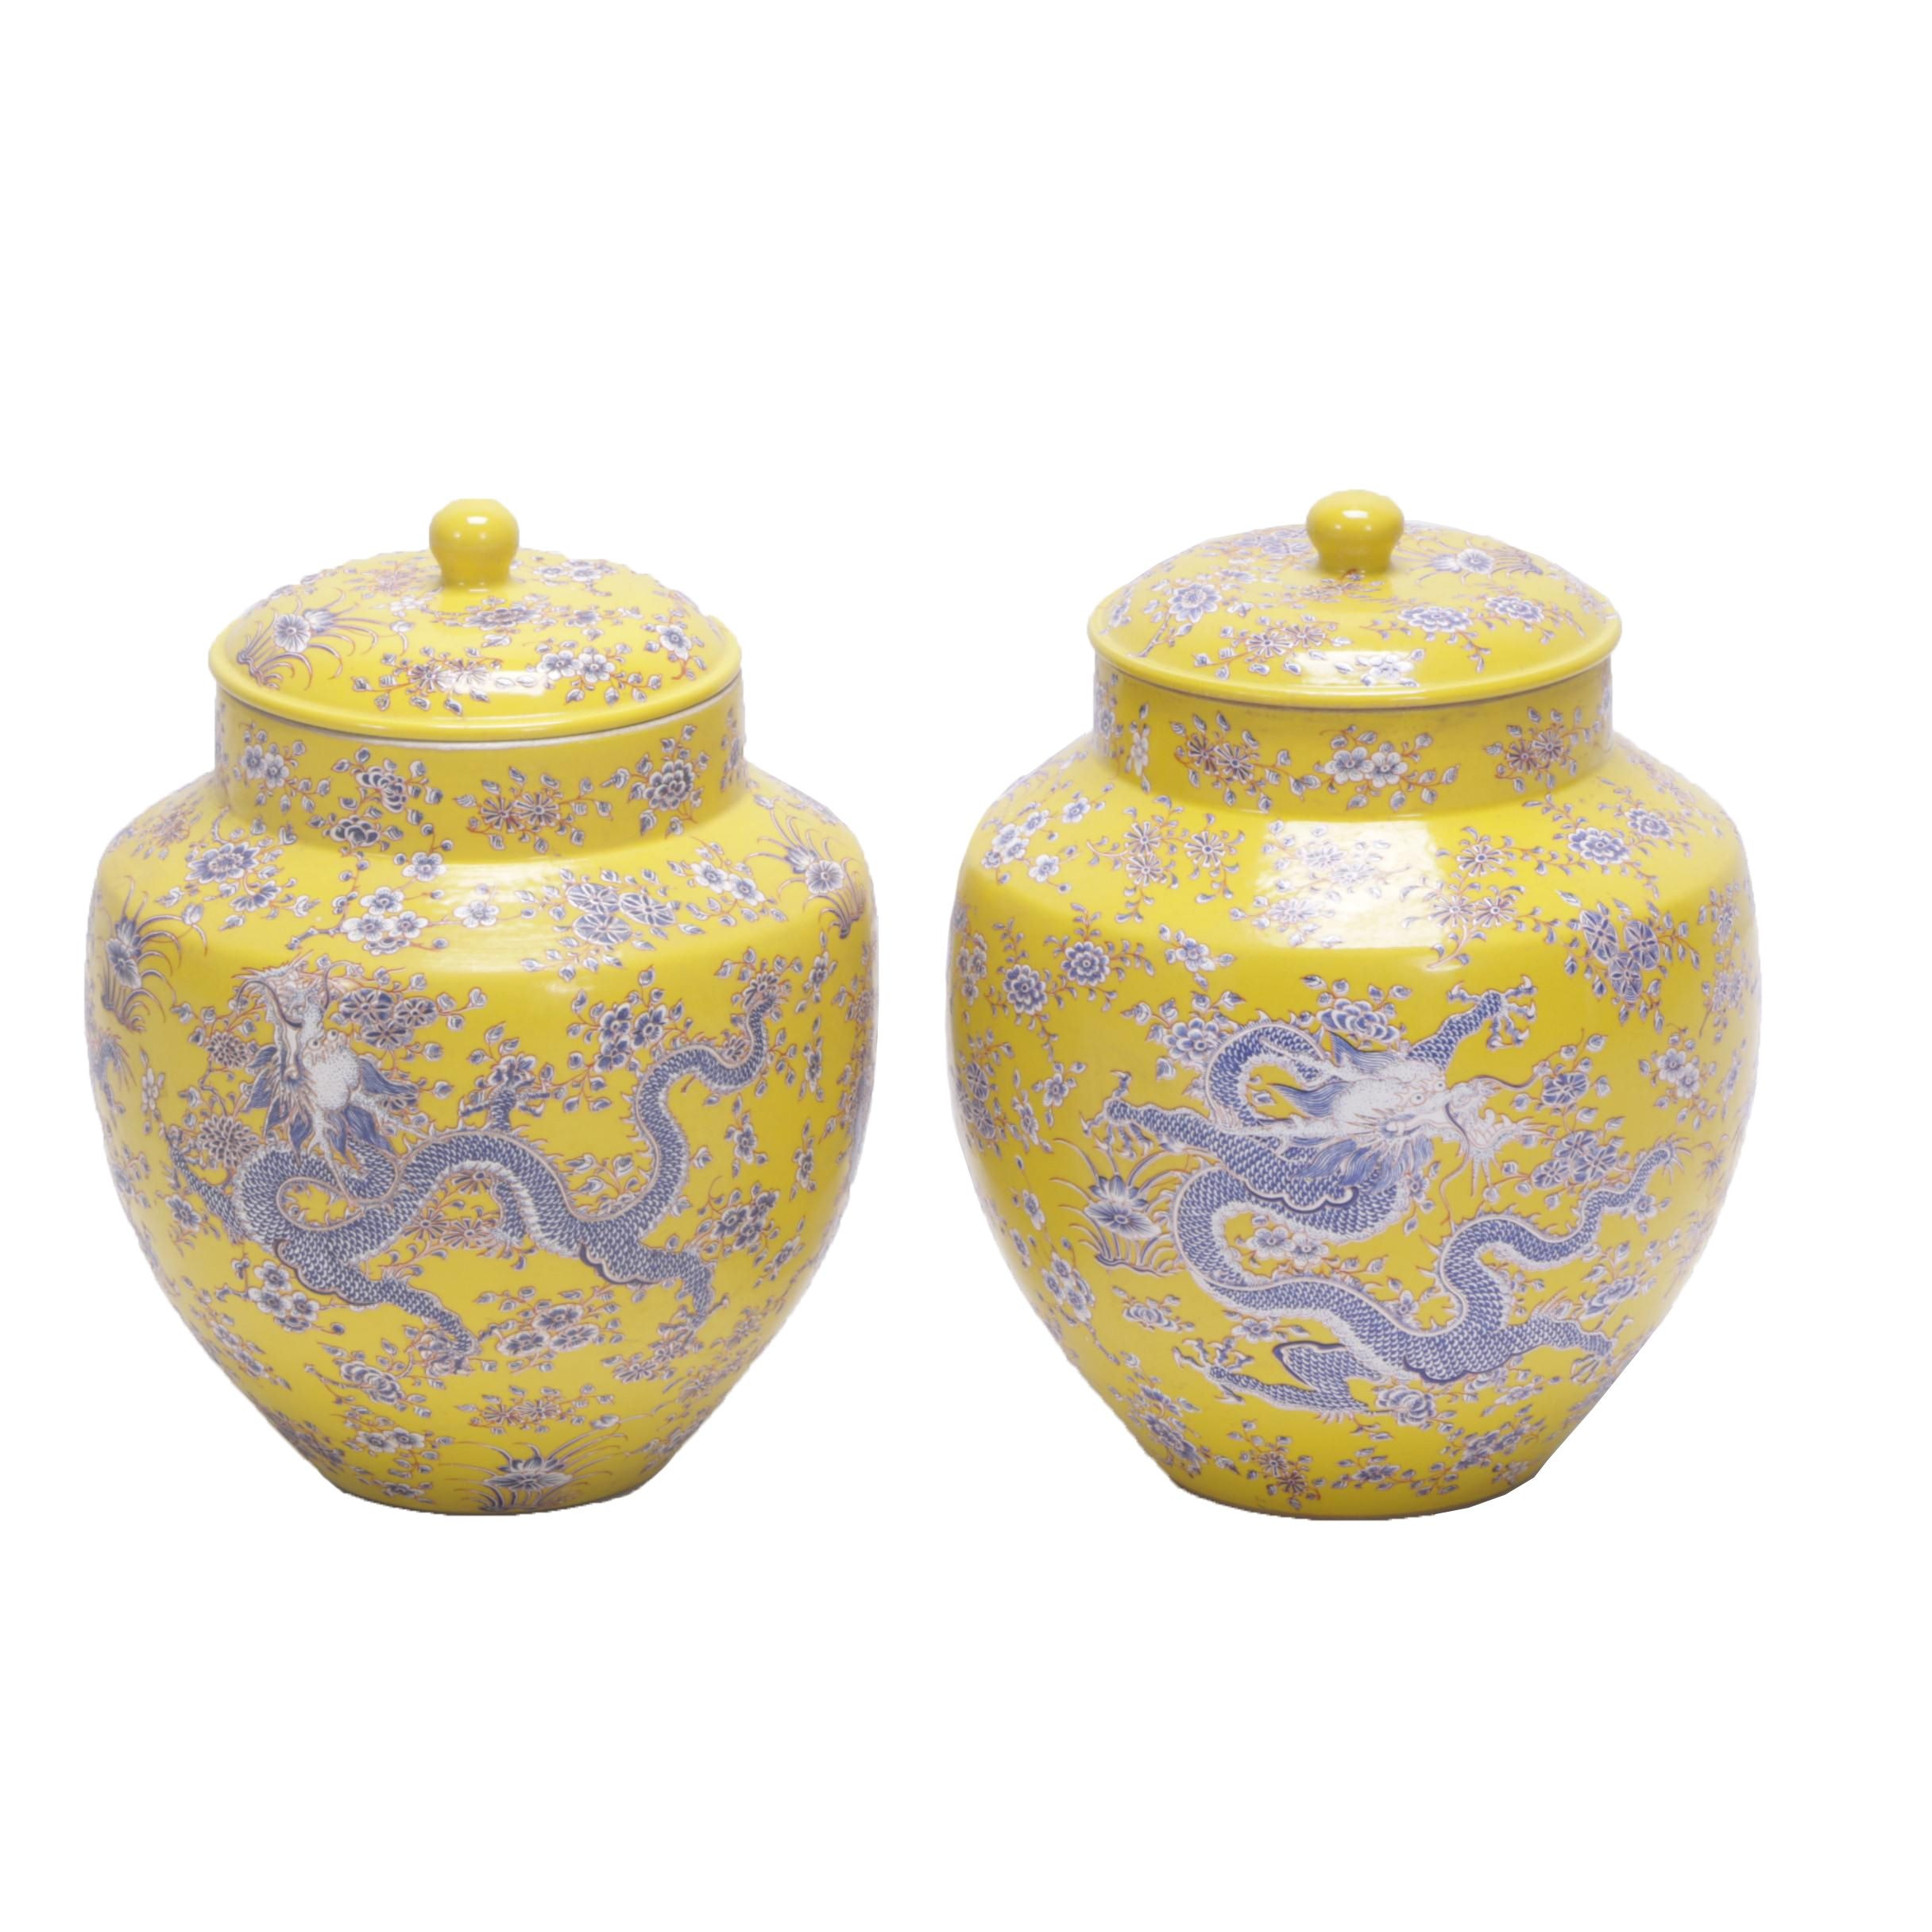 Chinese Hand-Painted Yellow Dragon Motif Porcelain Jars